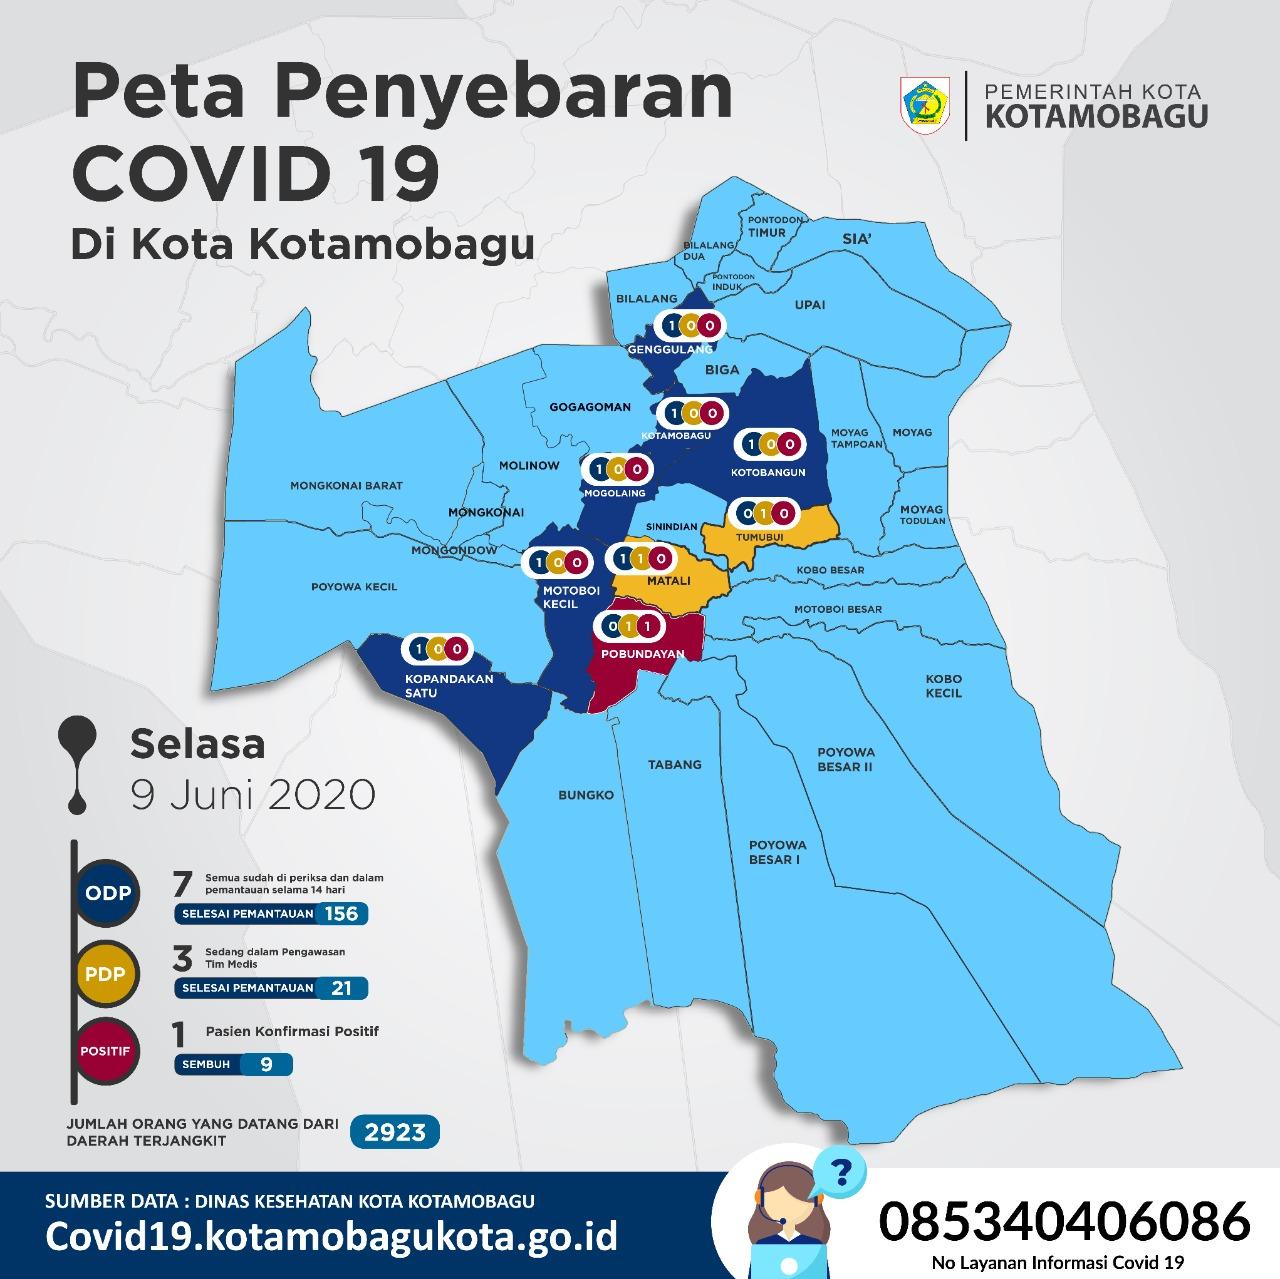 Kelurahan Pobundayan Zona Merah, Tinggal 1 Warga Kotamobagu Positif Covid 19 Dalam Perawatan RSUD Lolak